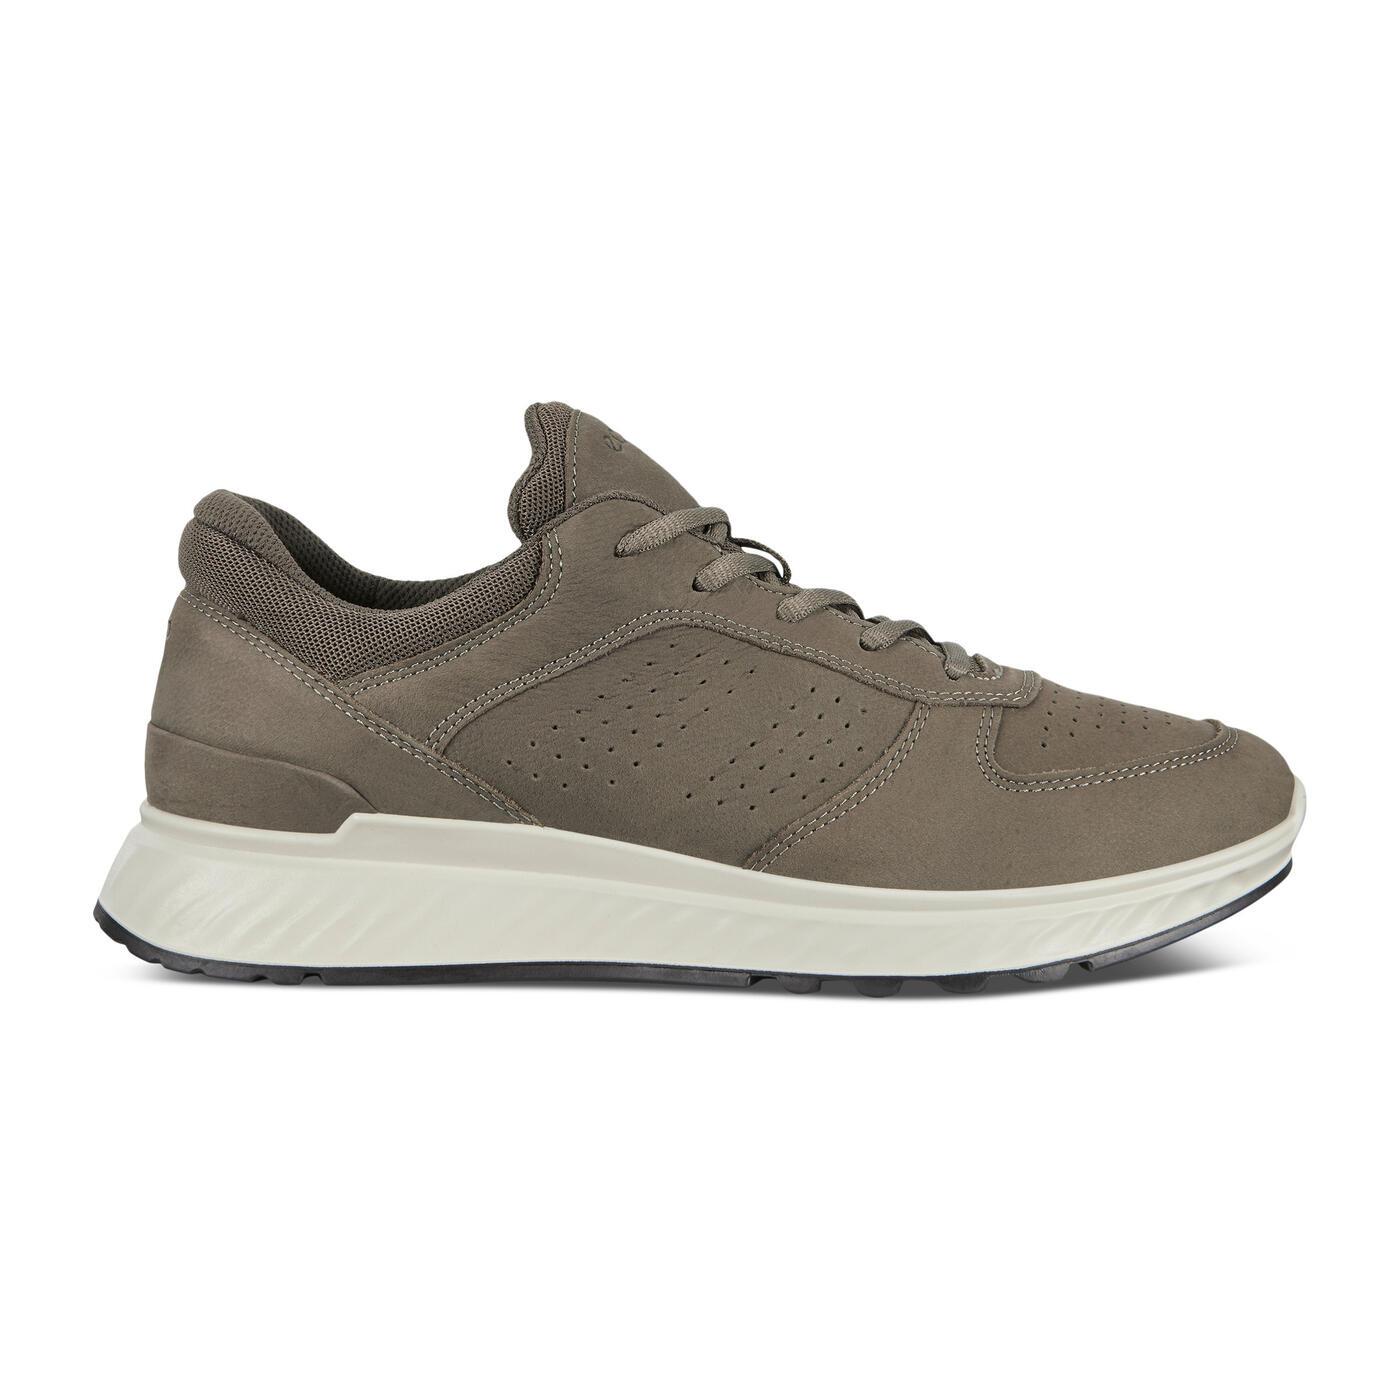 ECCO EXOSTRIDE Men's Shoe